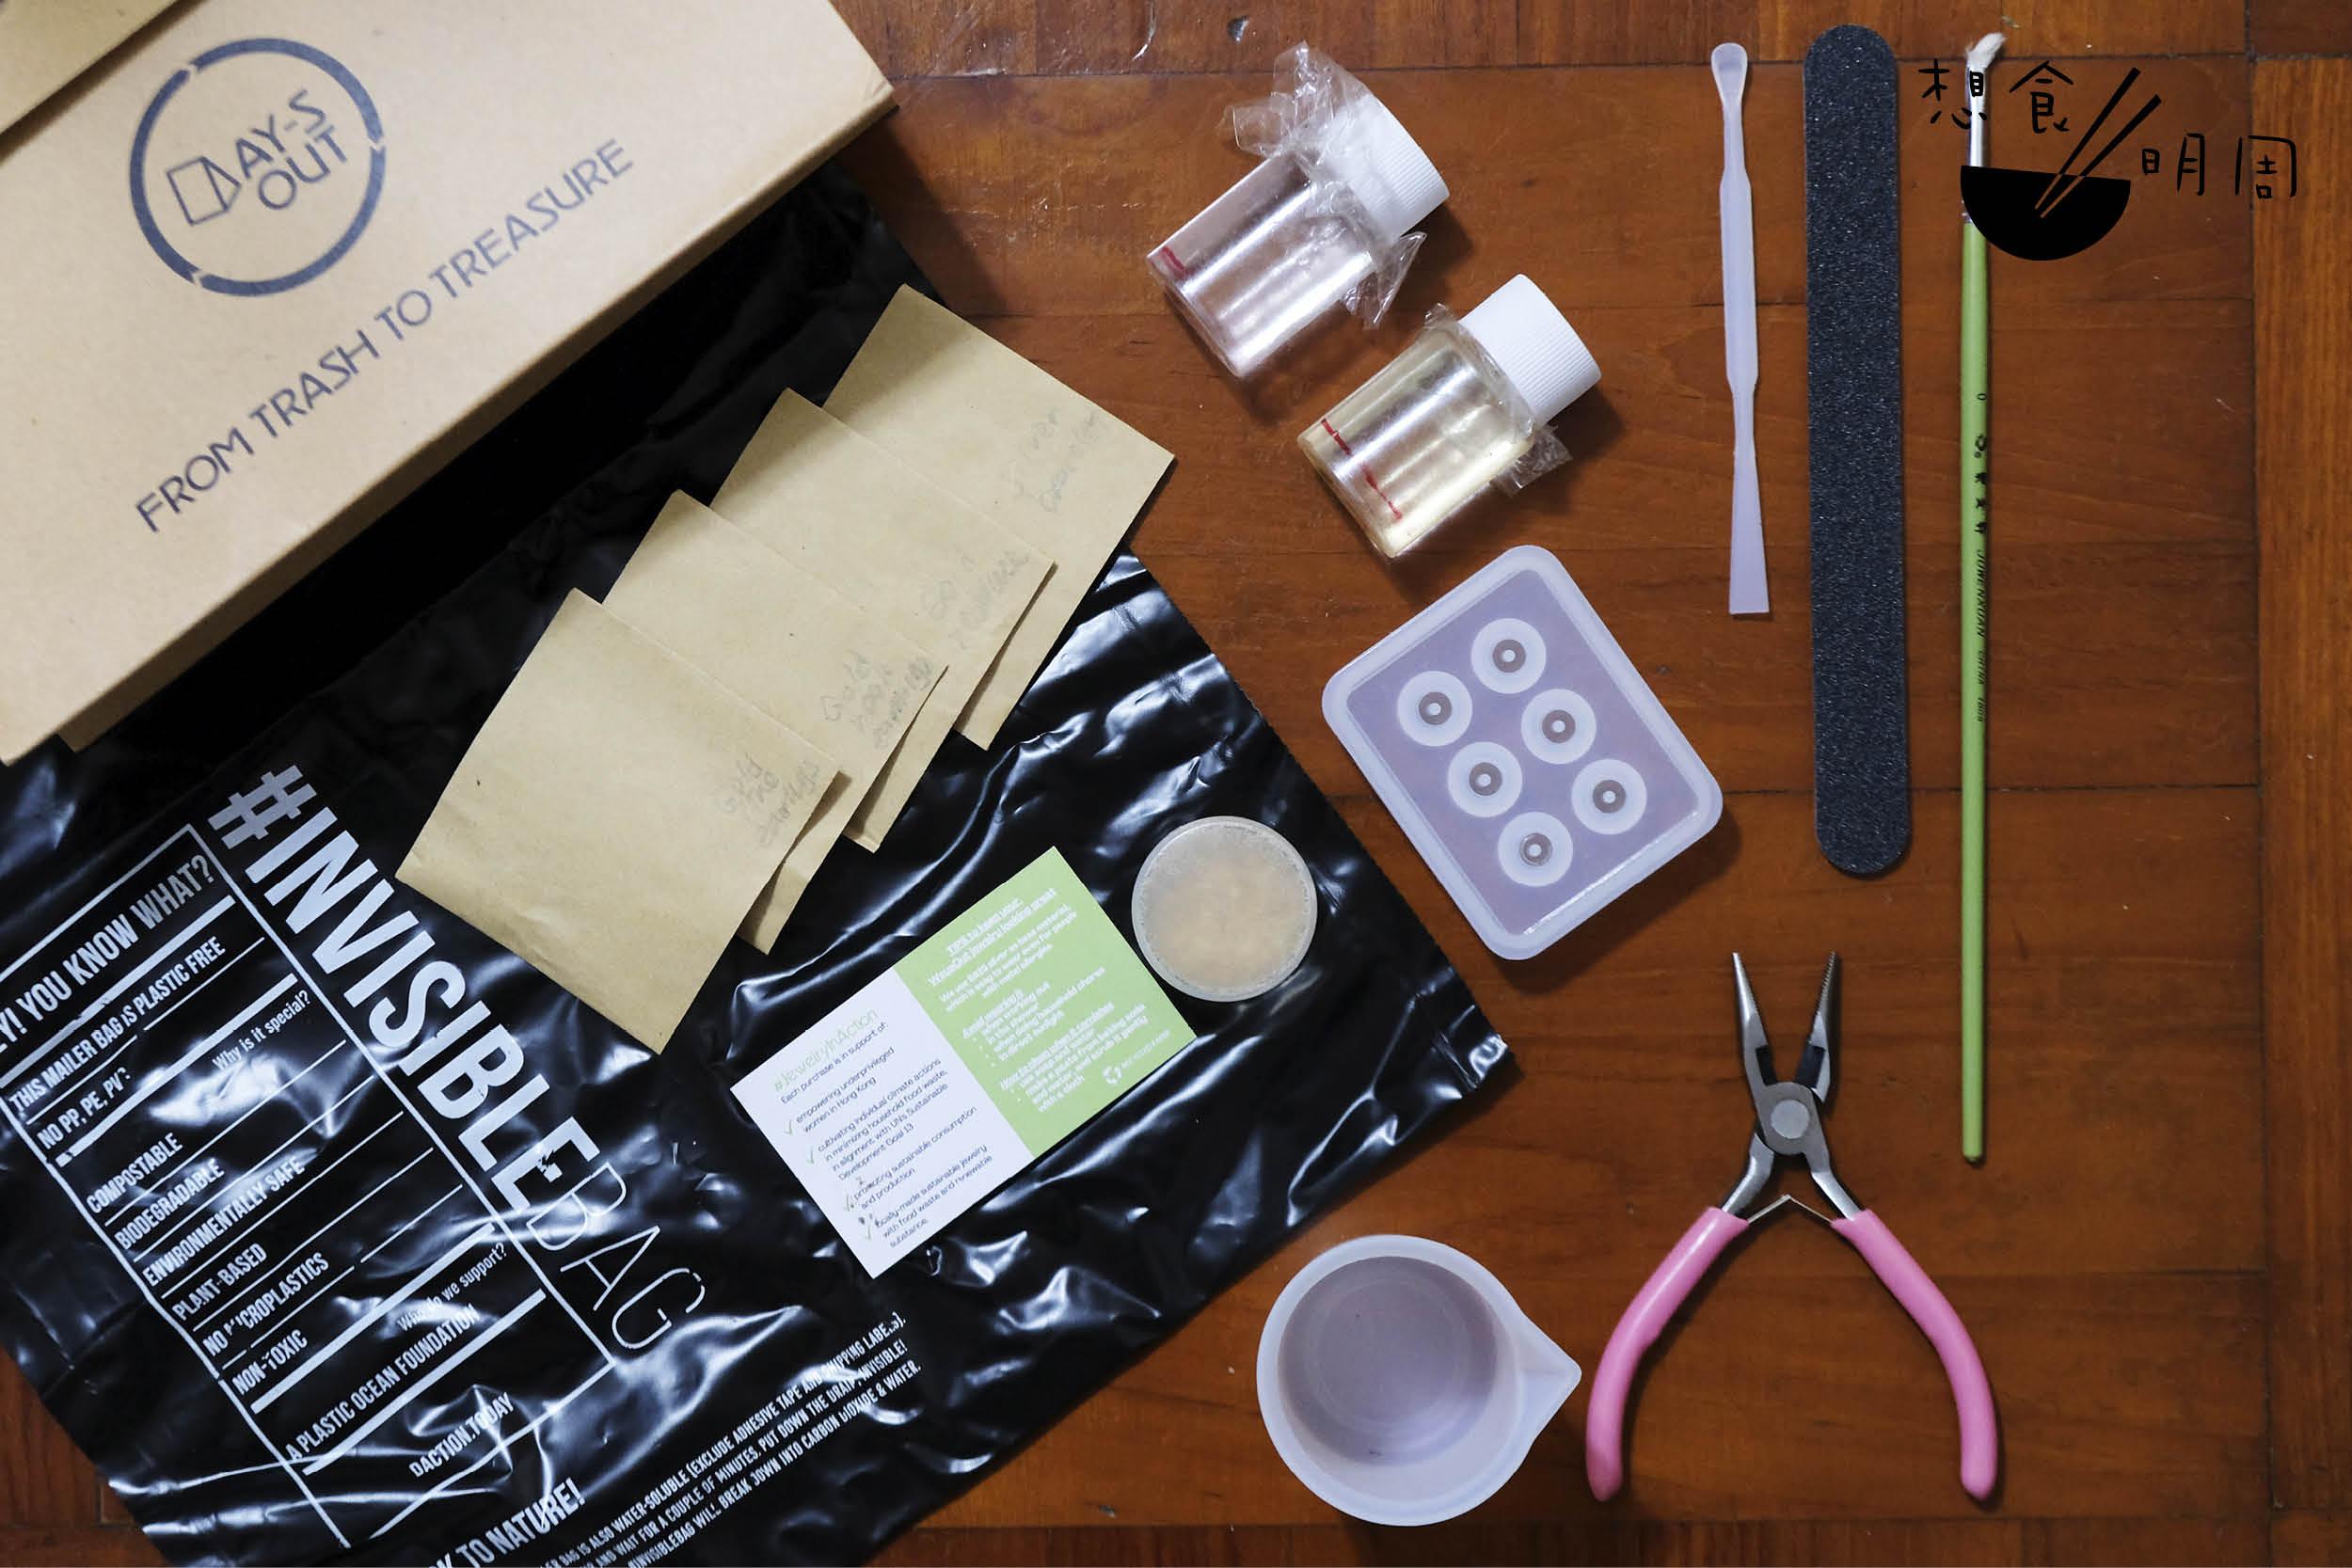 DIY kit // 訂購DIY製作包,內已齊備工具及用料,可製約12粒果皮「寶石」。歸還工具的話,更可獲回贈金額,下次購物使用。